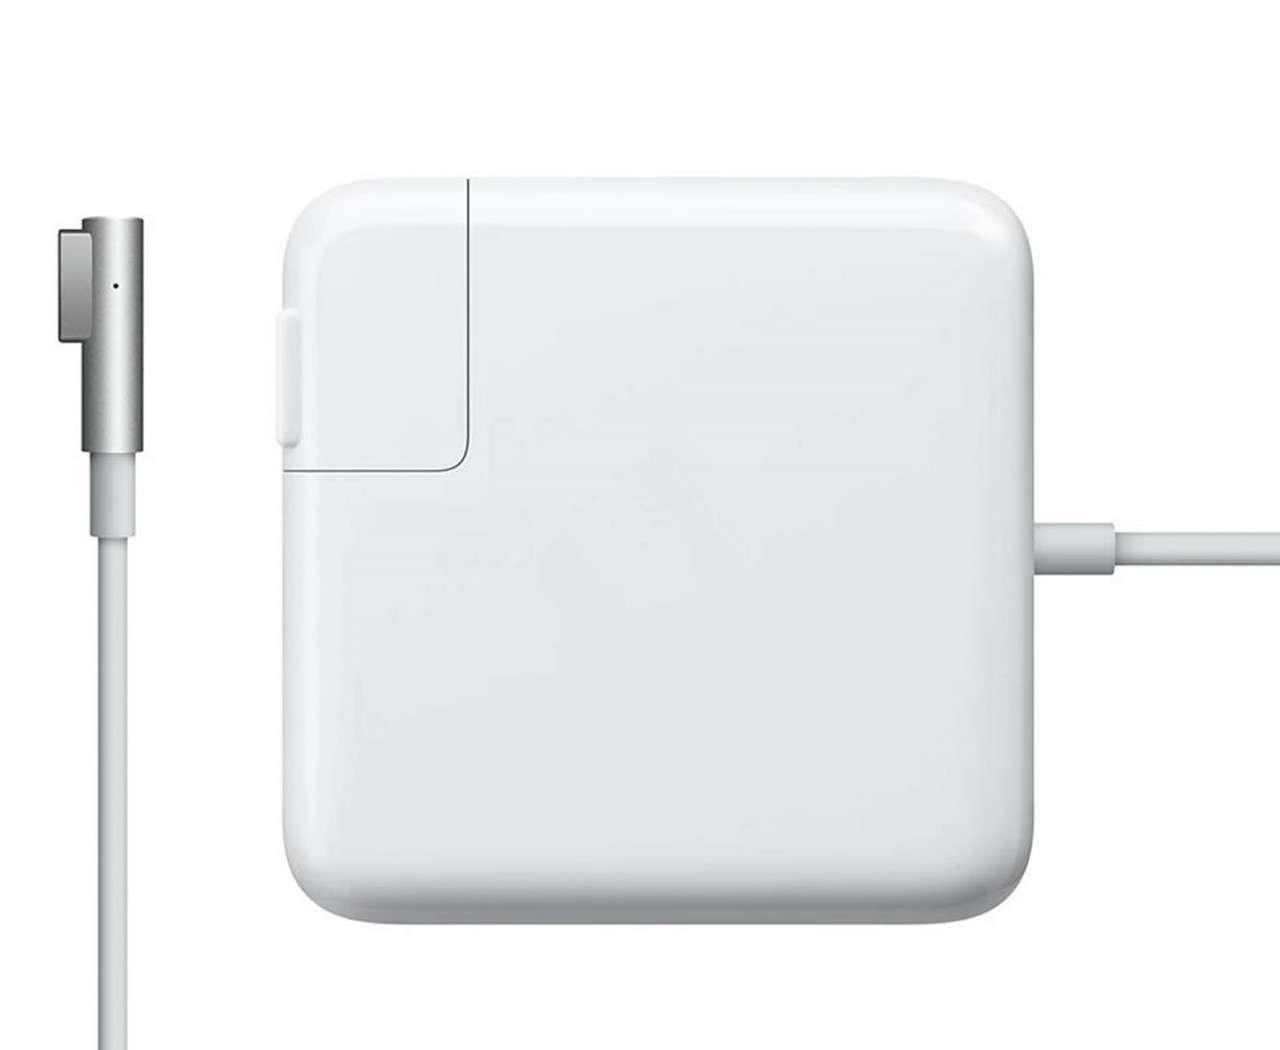 Incarcator Apple A1344 imagine powerlaptop.ro 2021